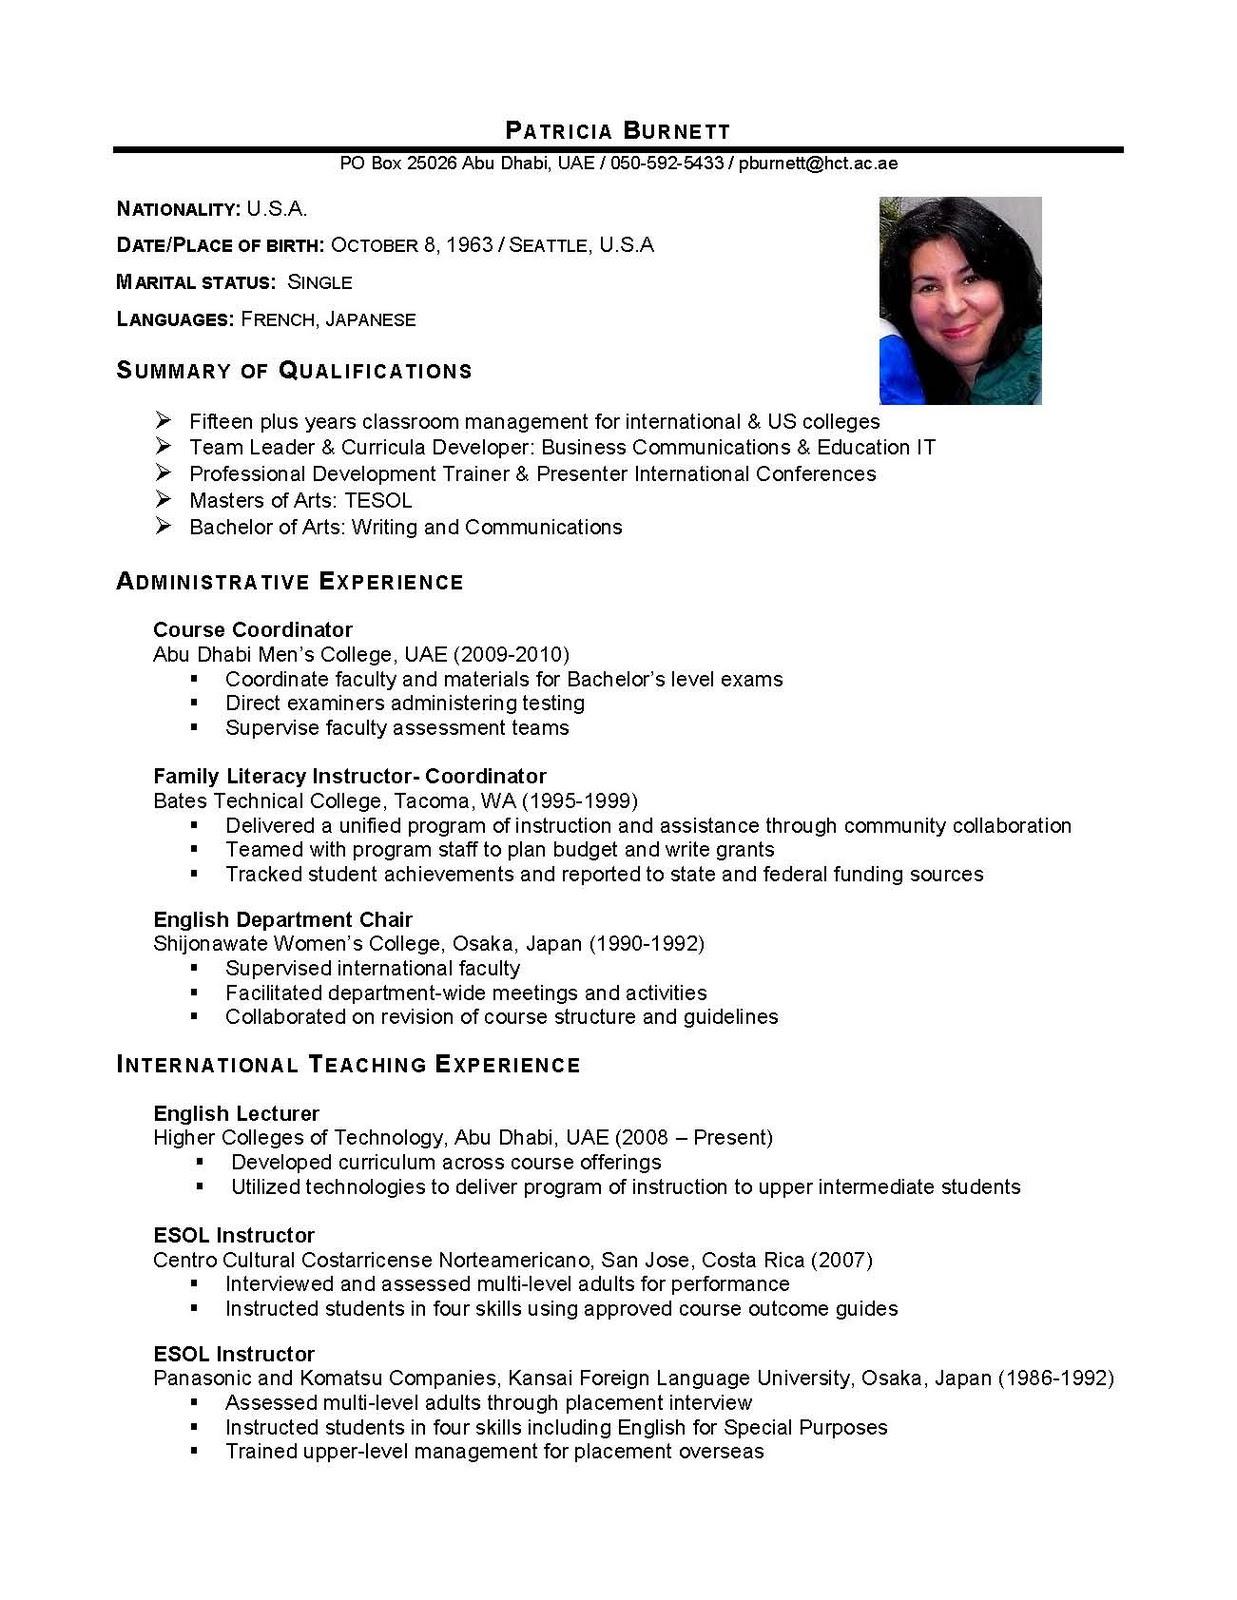 Scholarship Essay Writing Help   bestessay u com Midland Autocare